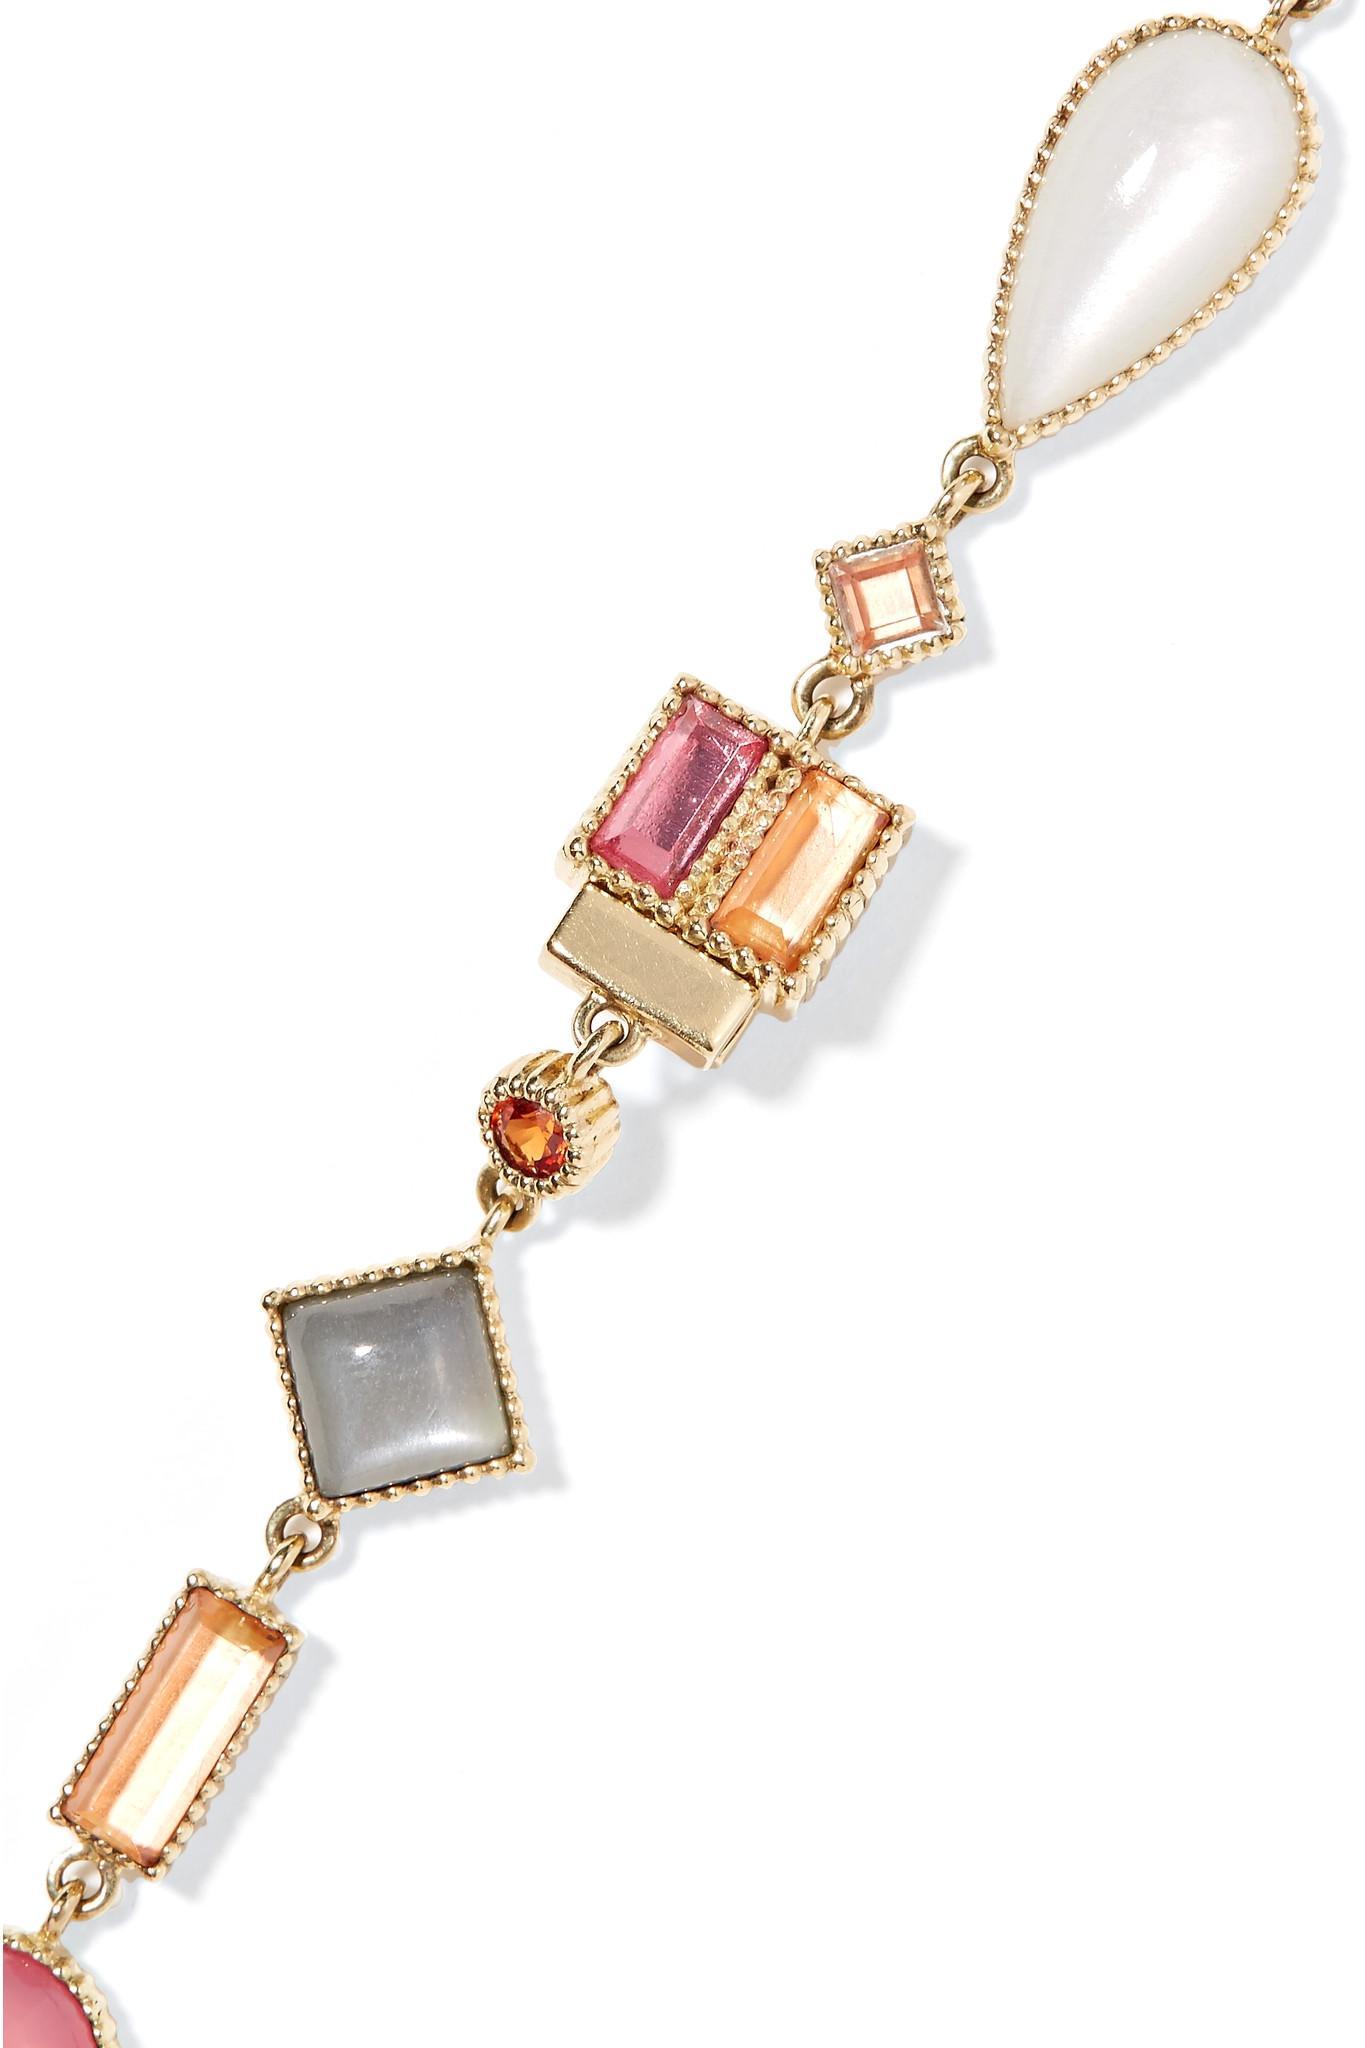 Larkspur & Hawk Cora Rivière 14-karat Gold Multi-stone Necklace in Metallic